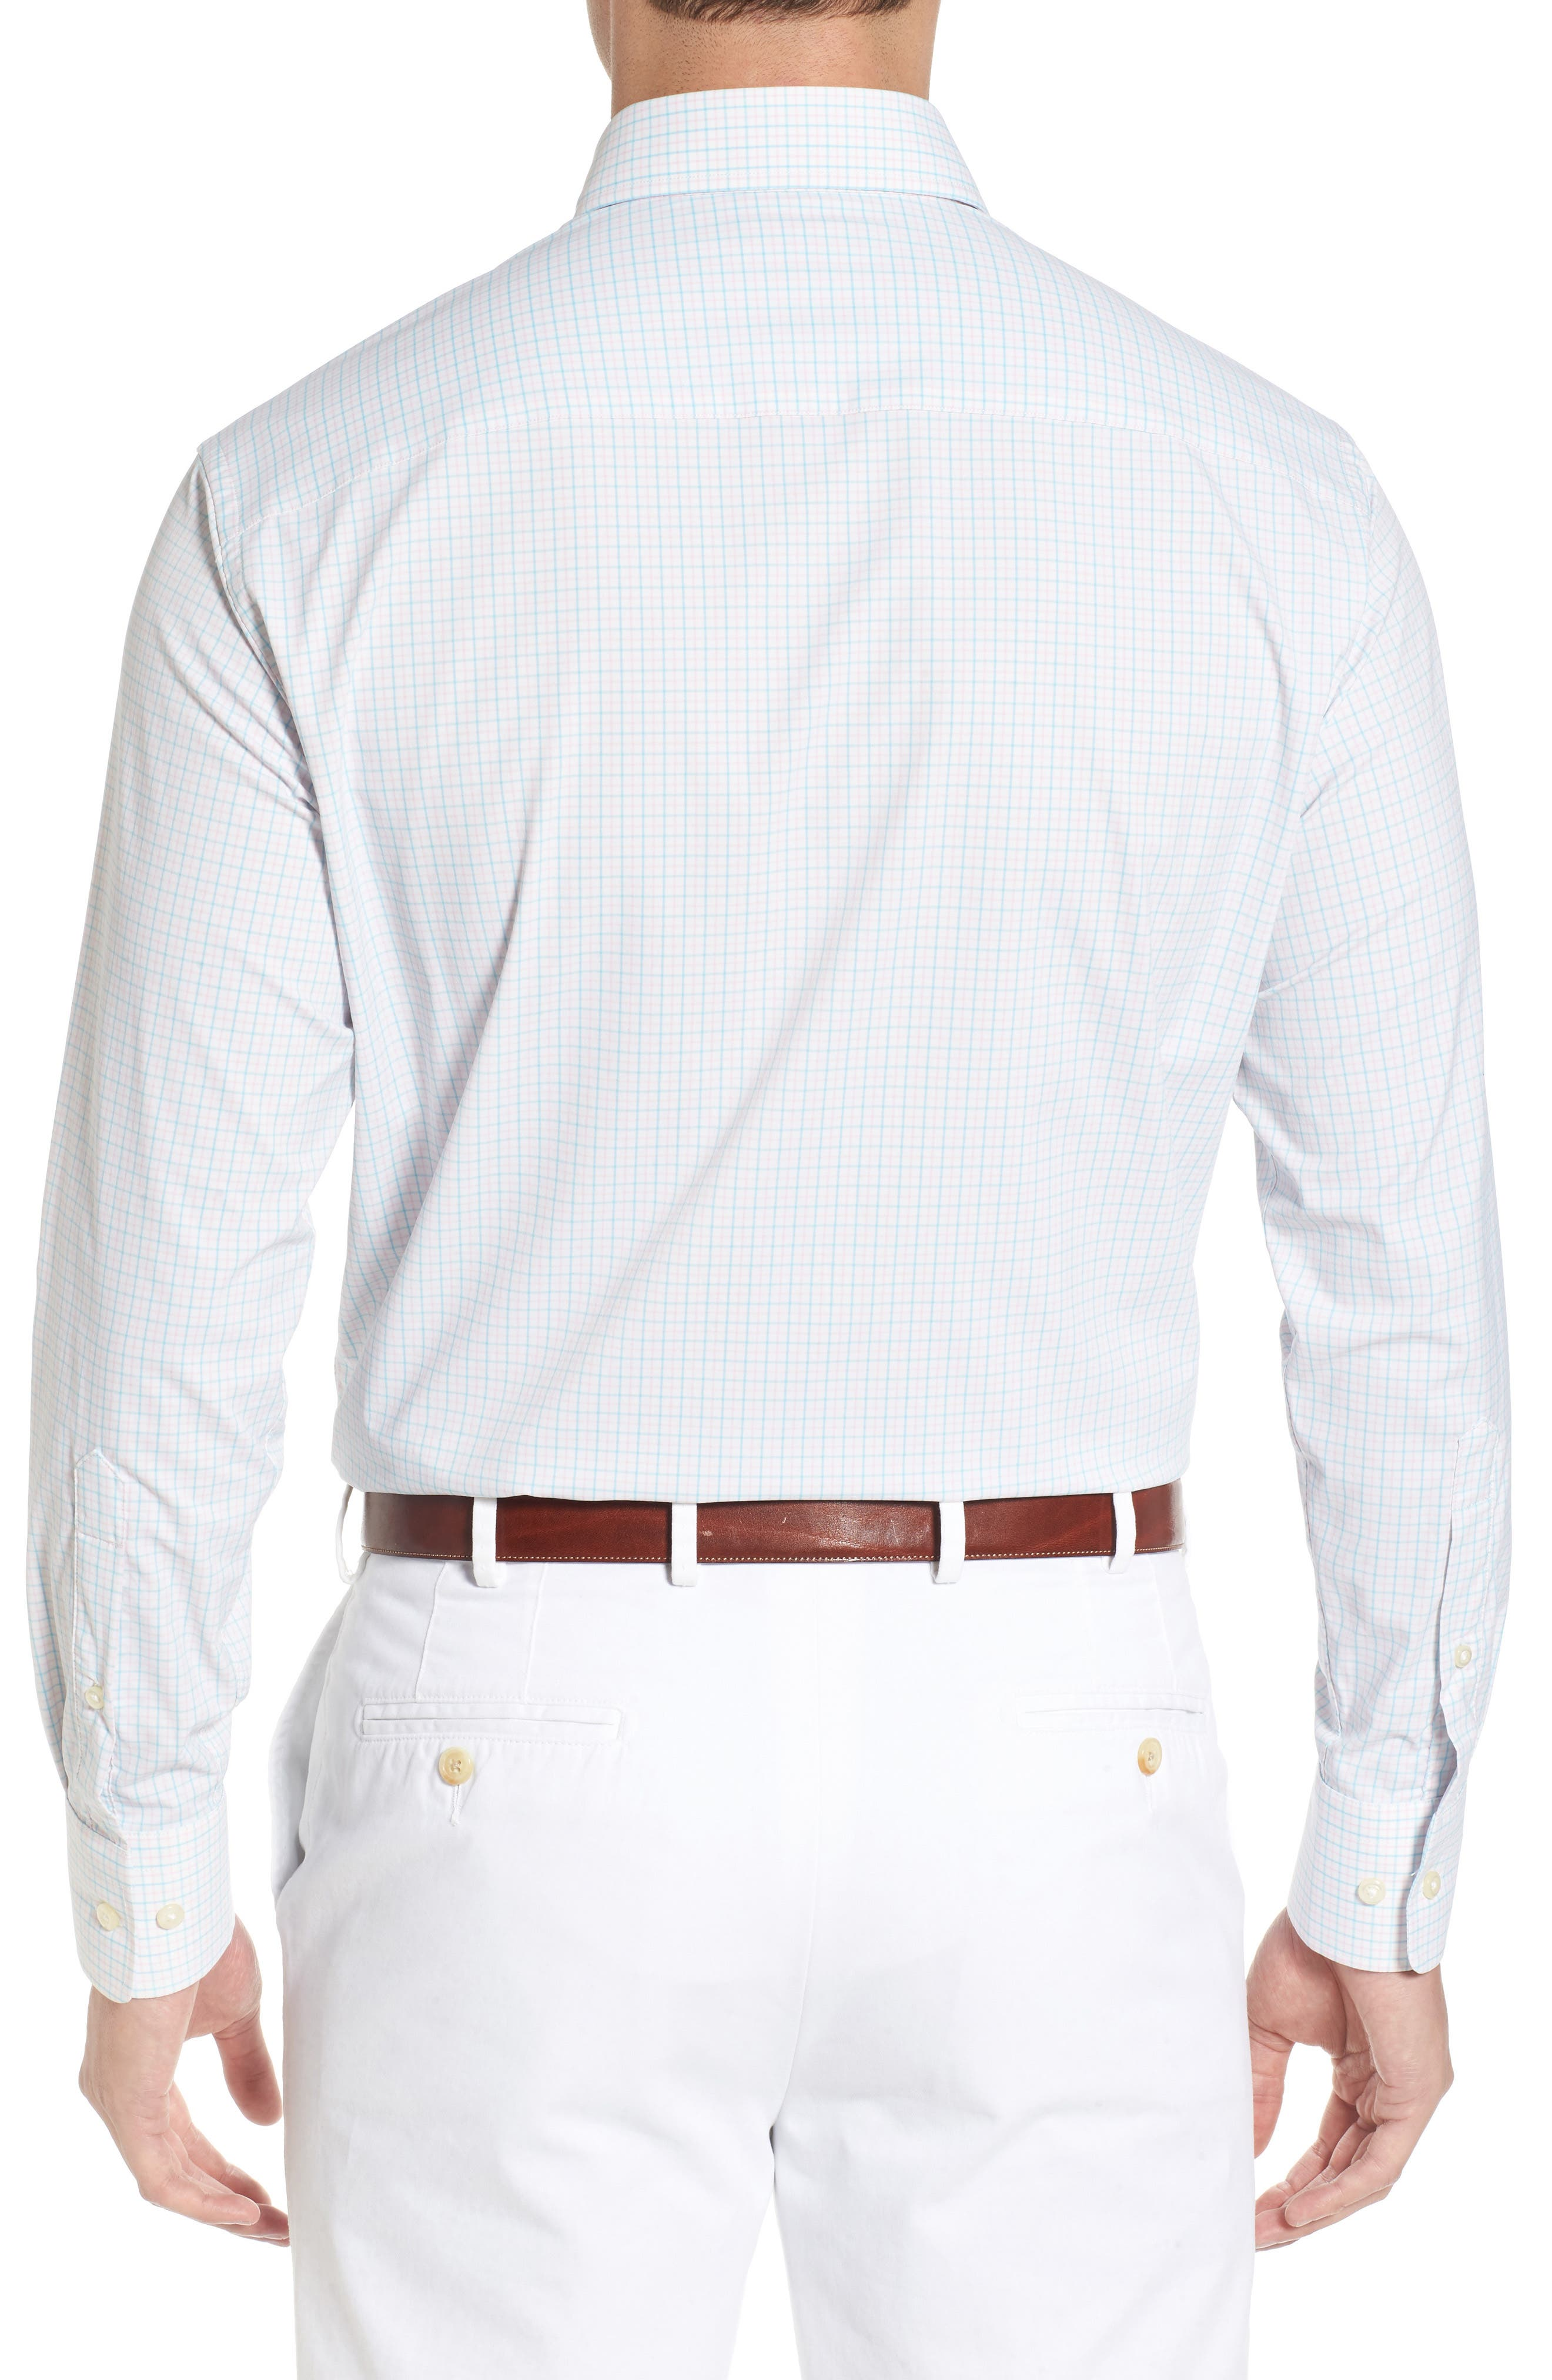 Waldorf Regular Fit Tattersall Performance Sport Shirt,                             Alternate thumbnail 3, color,                             White/ Piglet Pink